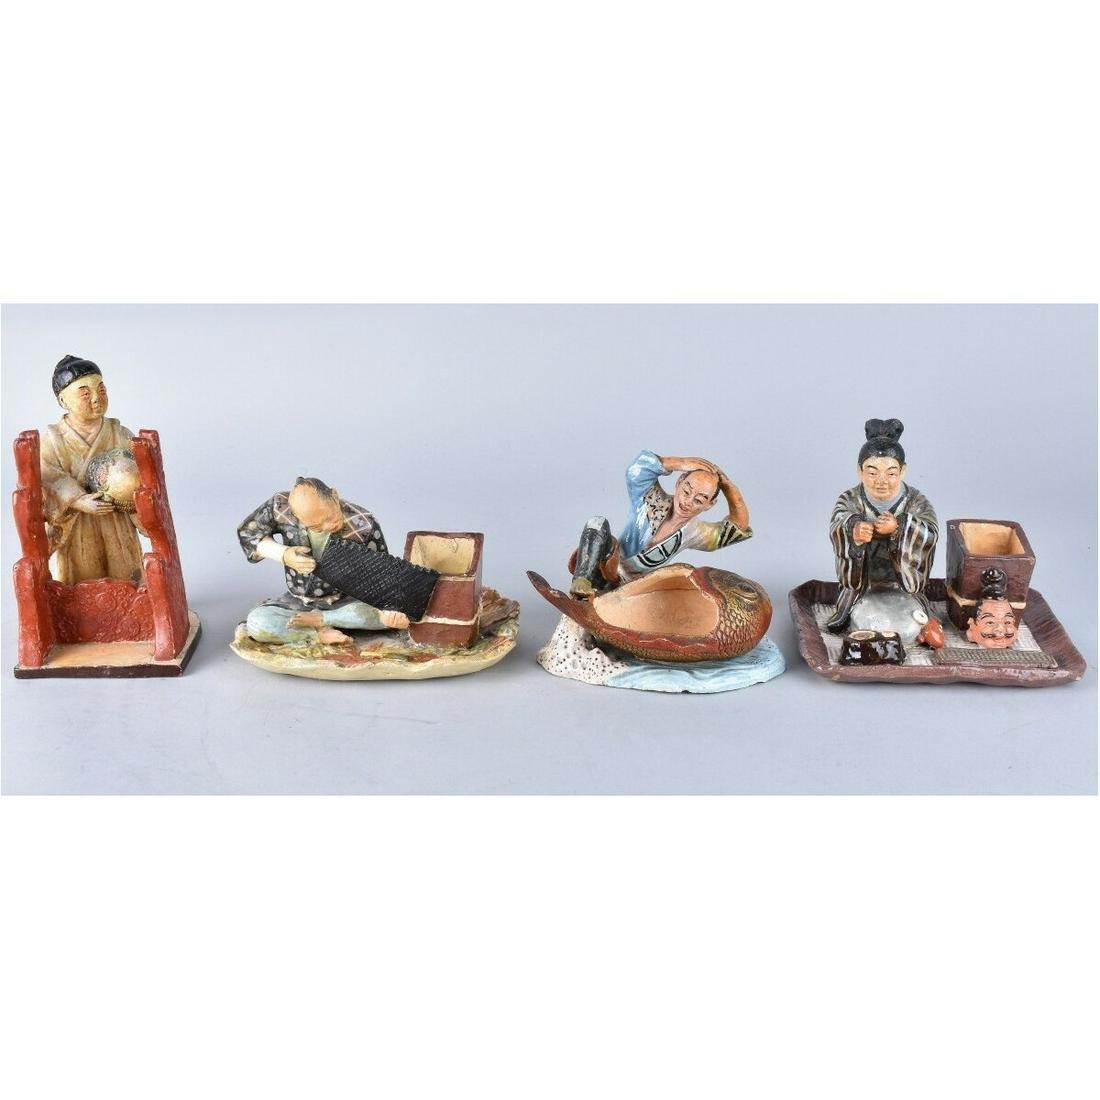 4 Vintage Japanese Pottery Figures